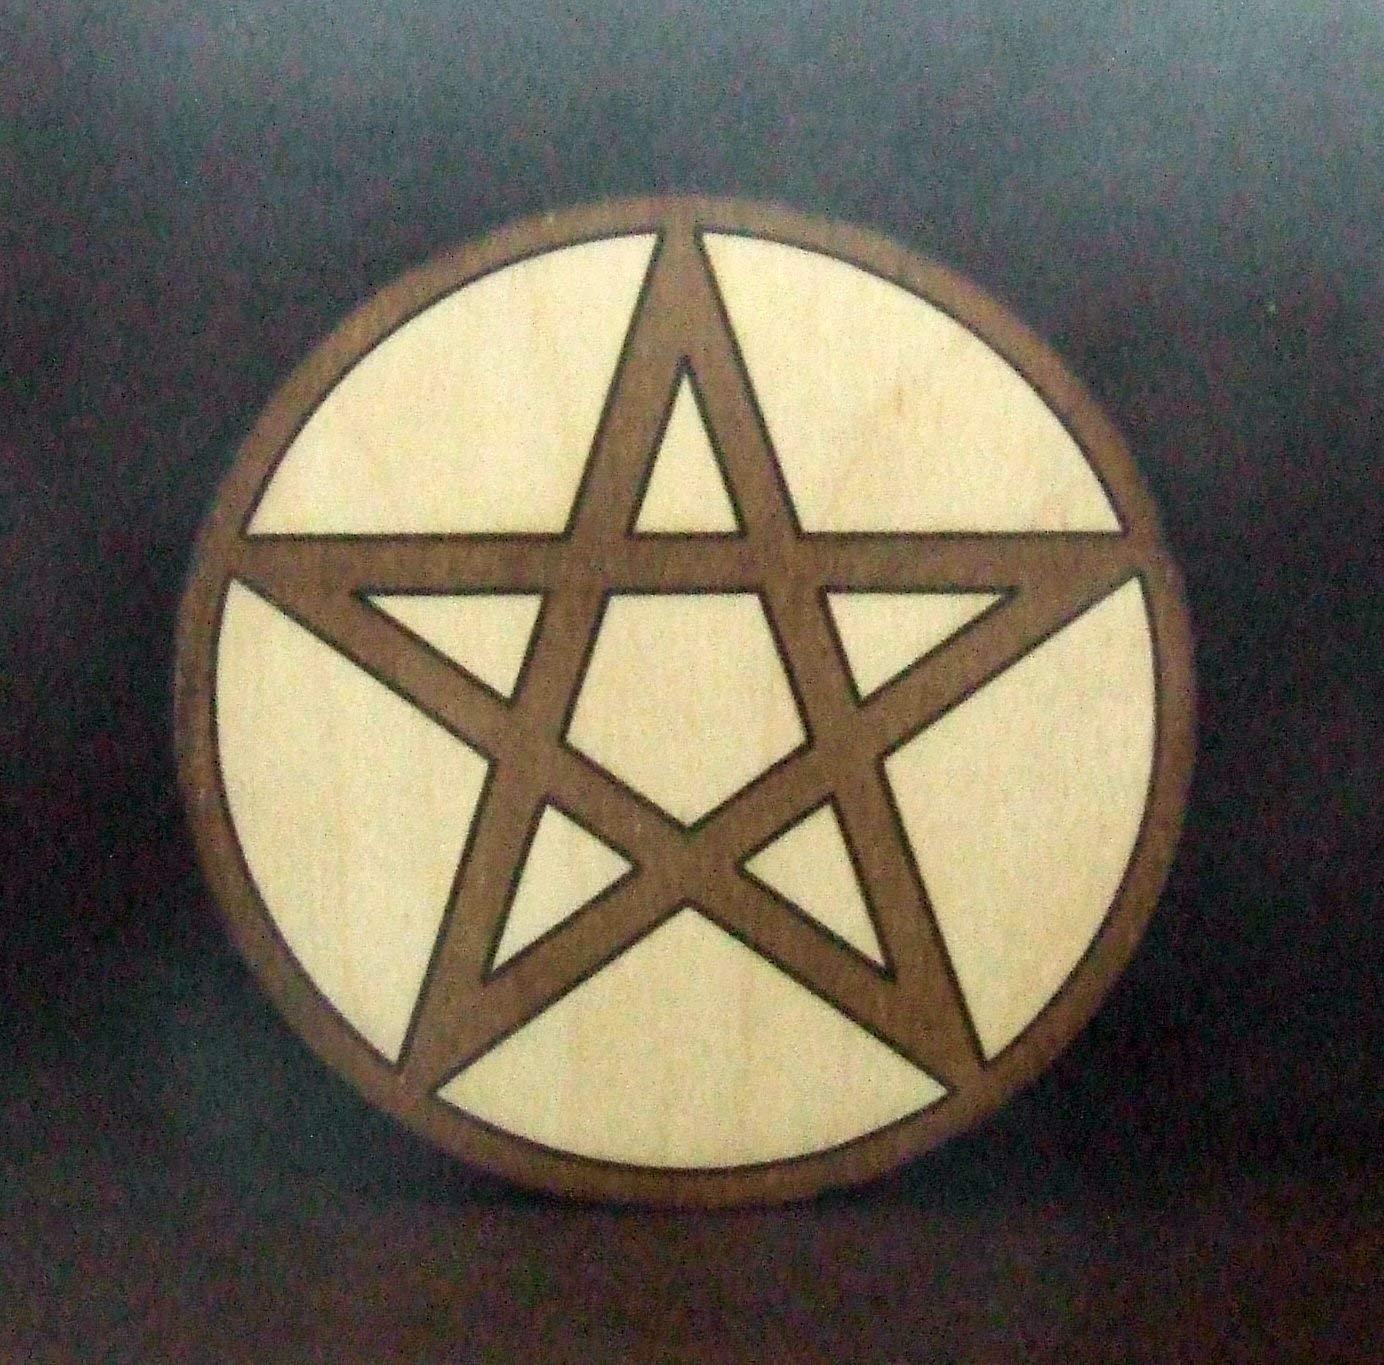 Pentacle handmade wooden wall plaque